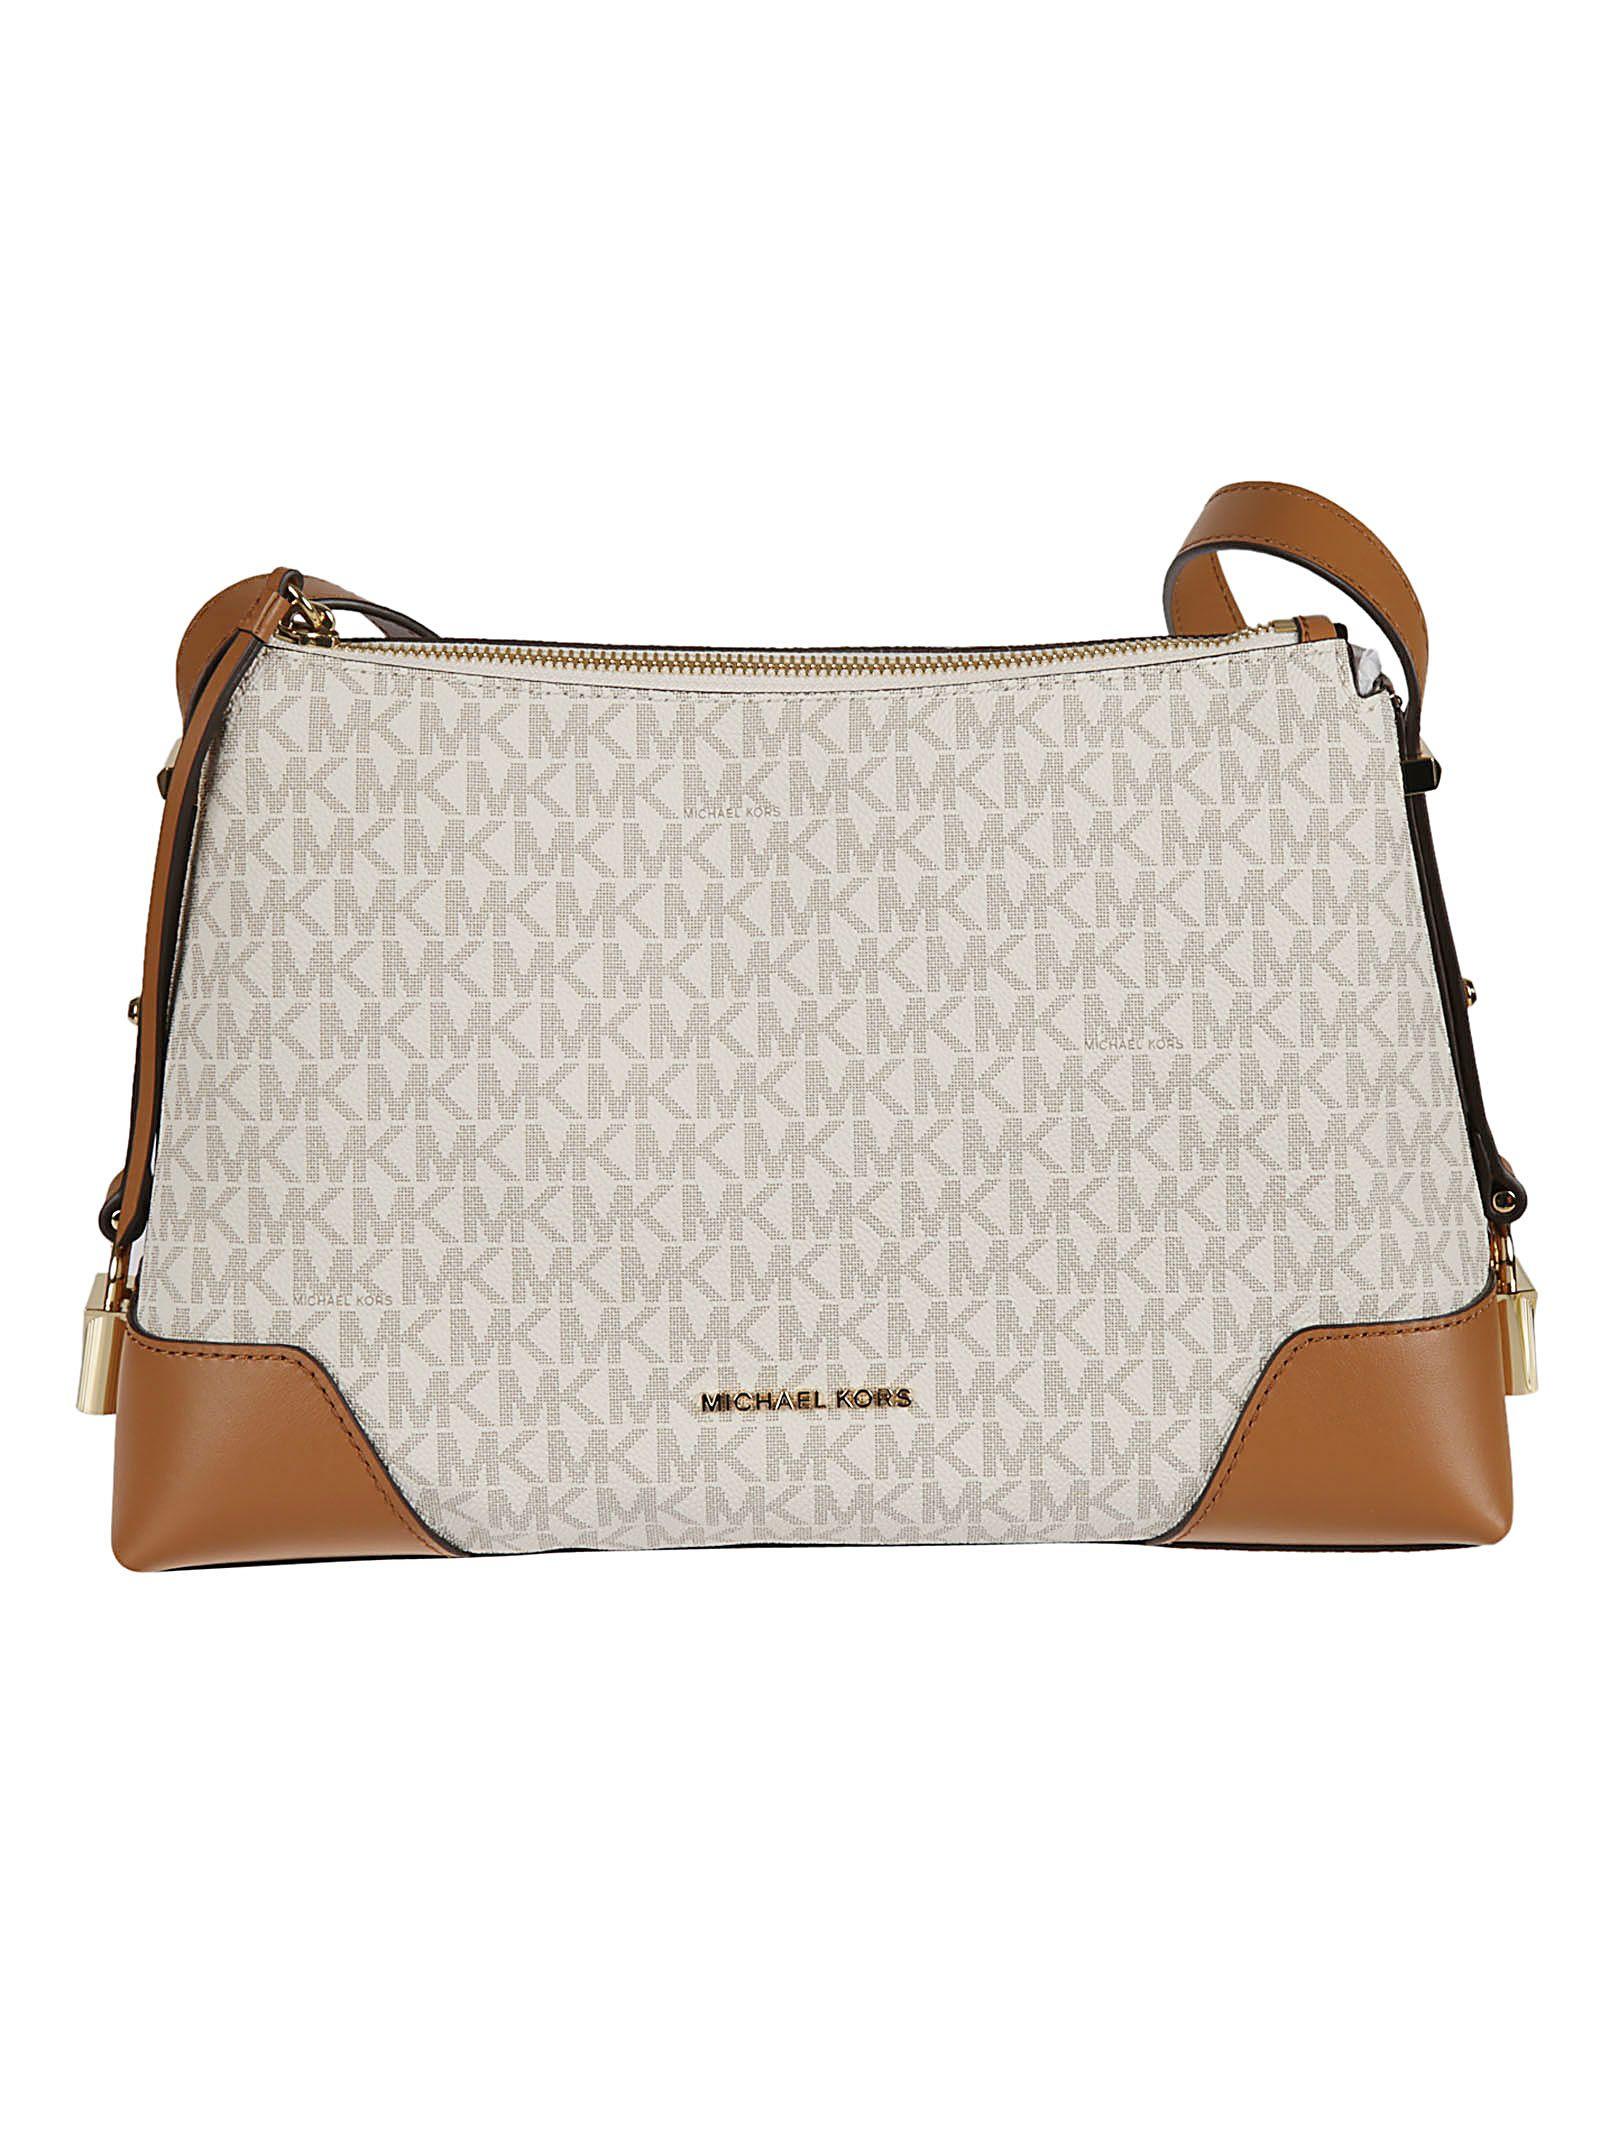 167eeeb78946 Michael Kors Michael Kors Crosby Monogram Shoulder Bag - Vanilla ...